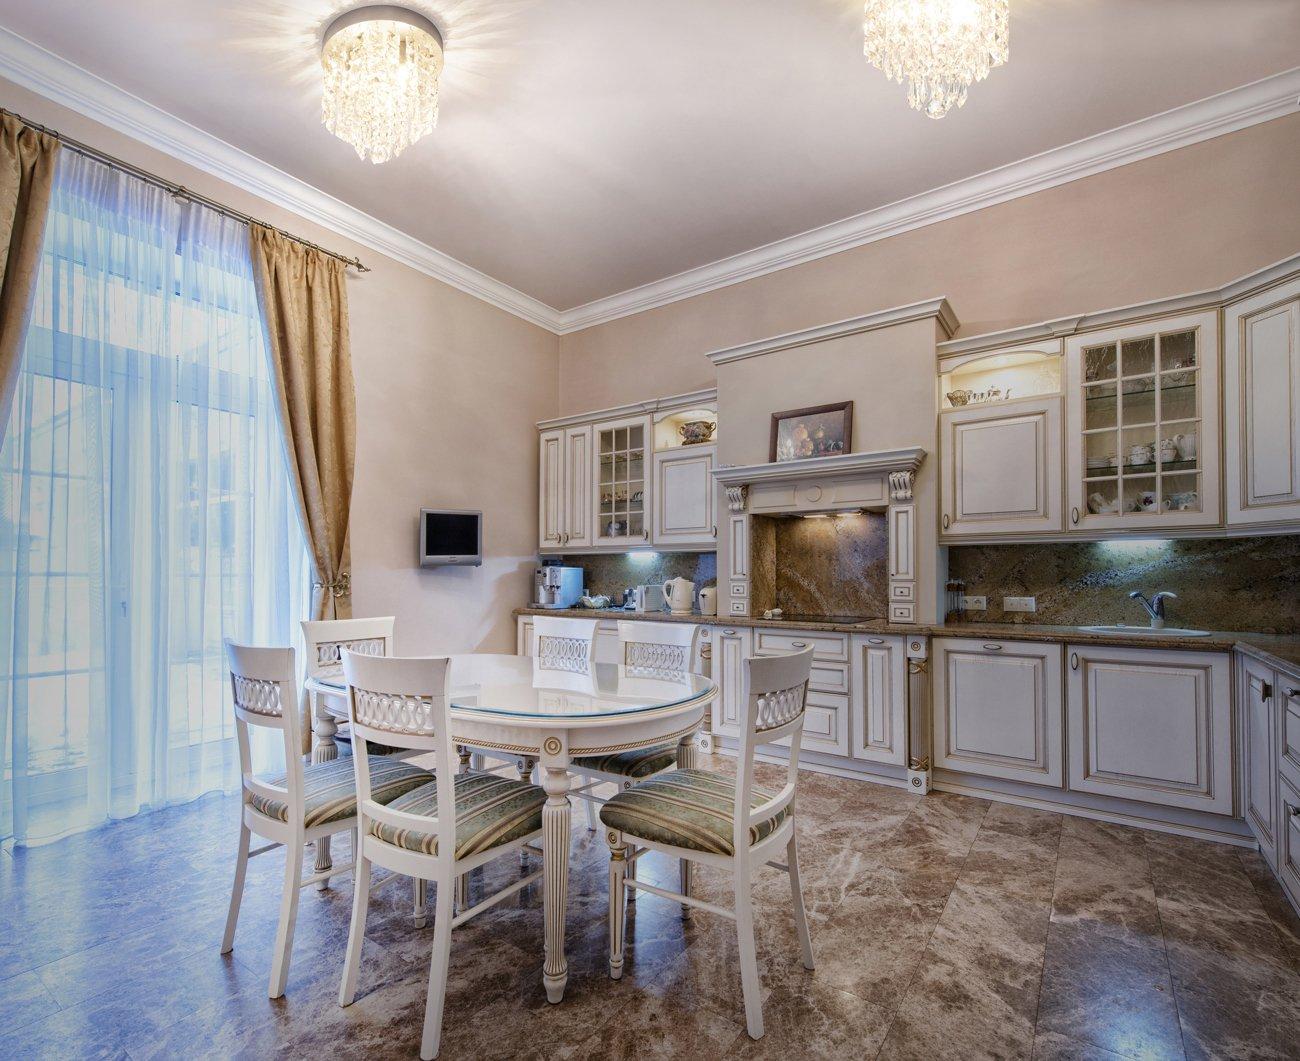 SHINE HAI Crystal Chandelier, 3-light Modern Flush Mount Ceiling Pendant Light H9.45'' X W8.66'' for Bedroom, Living Room, Dining Room, Kitchen, Hallway by SHINE HAI (Image #5)